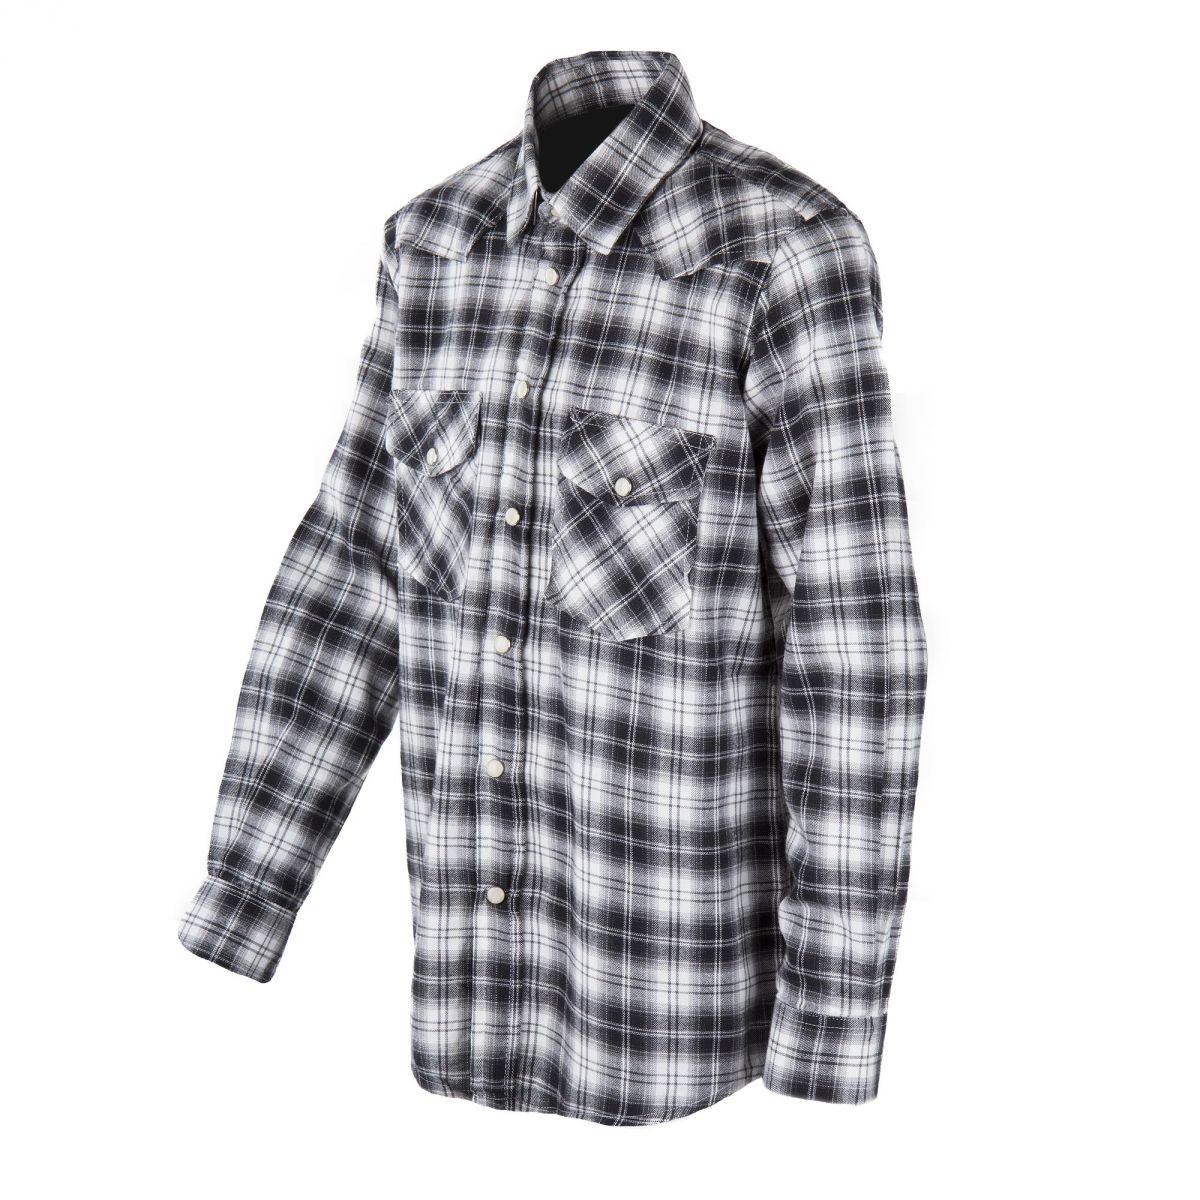 chemise carreaux manches longues gar on best mountain prix. Black Bedroom Furniture Sets. Home Design Ideas